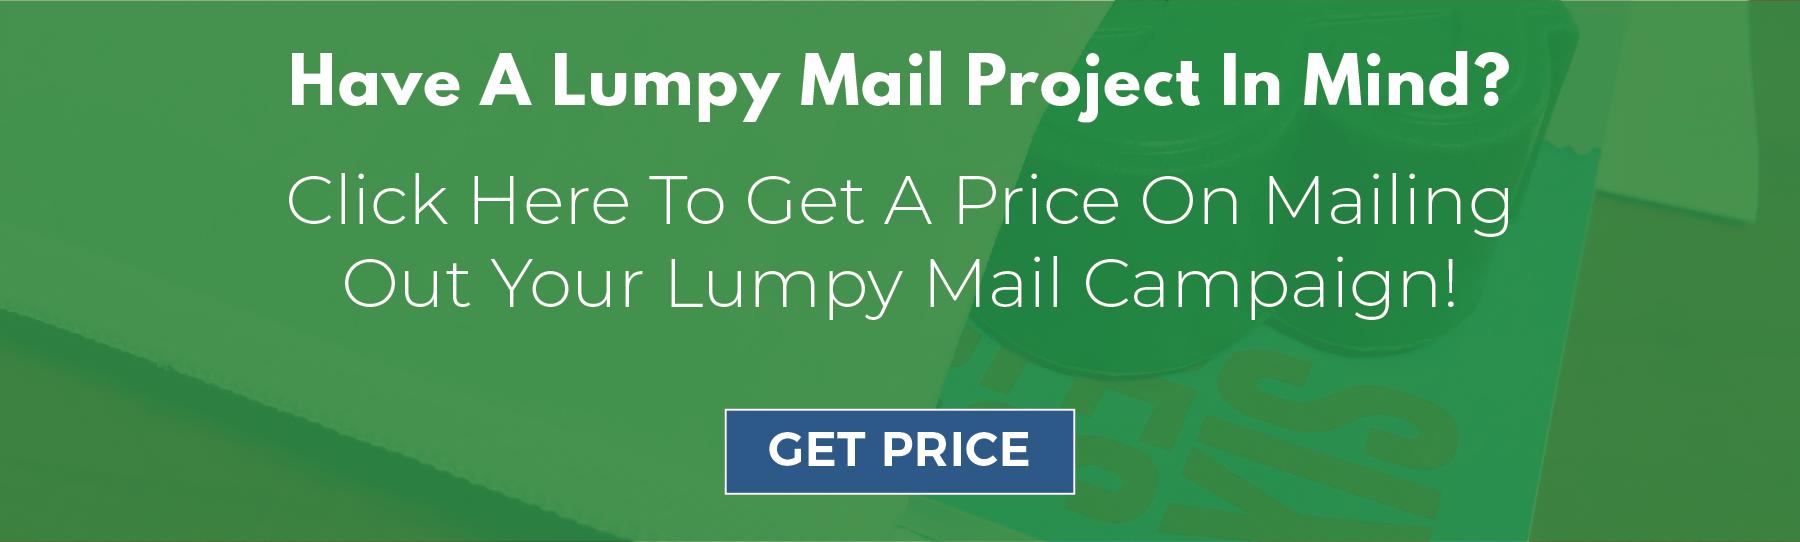 lumpy-mail-price